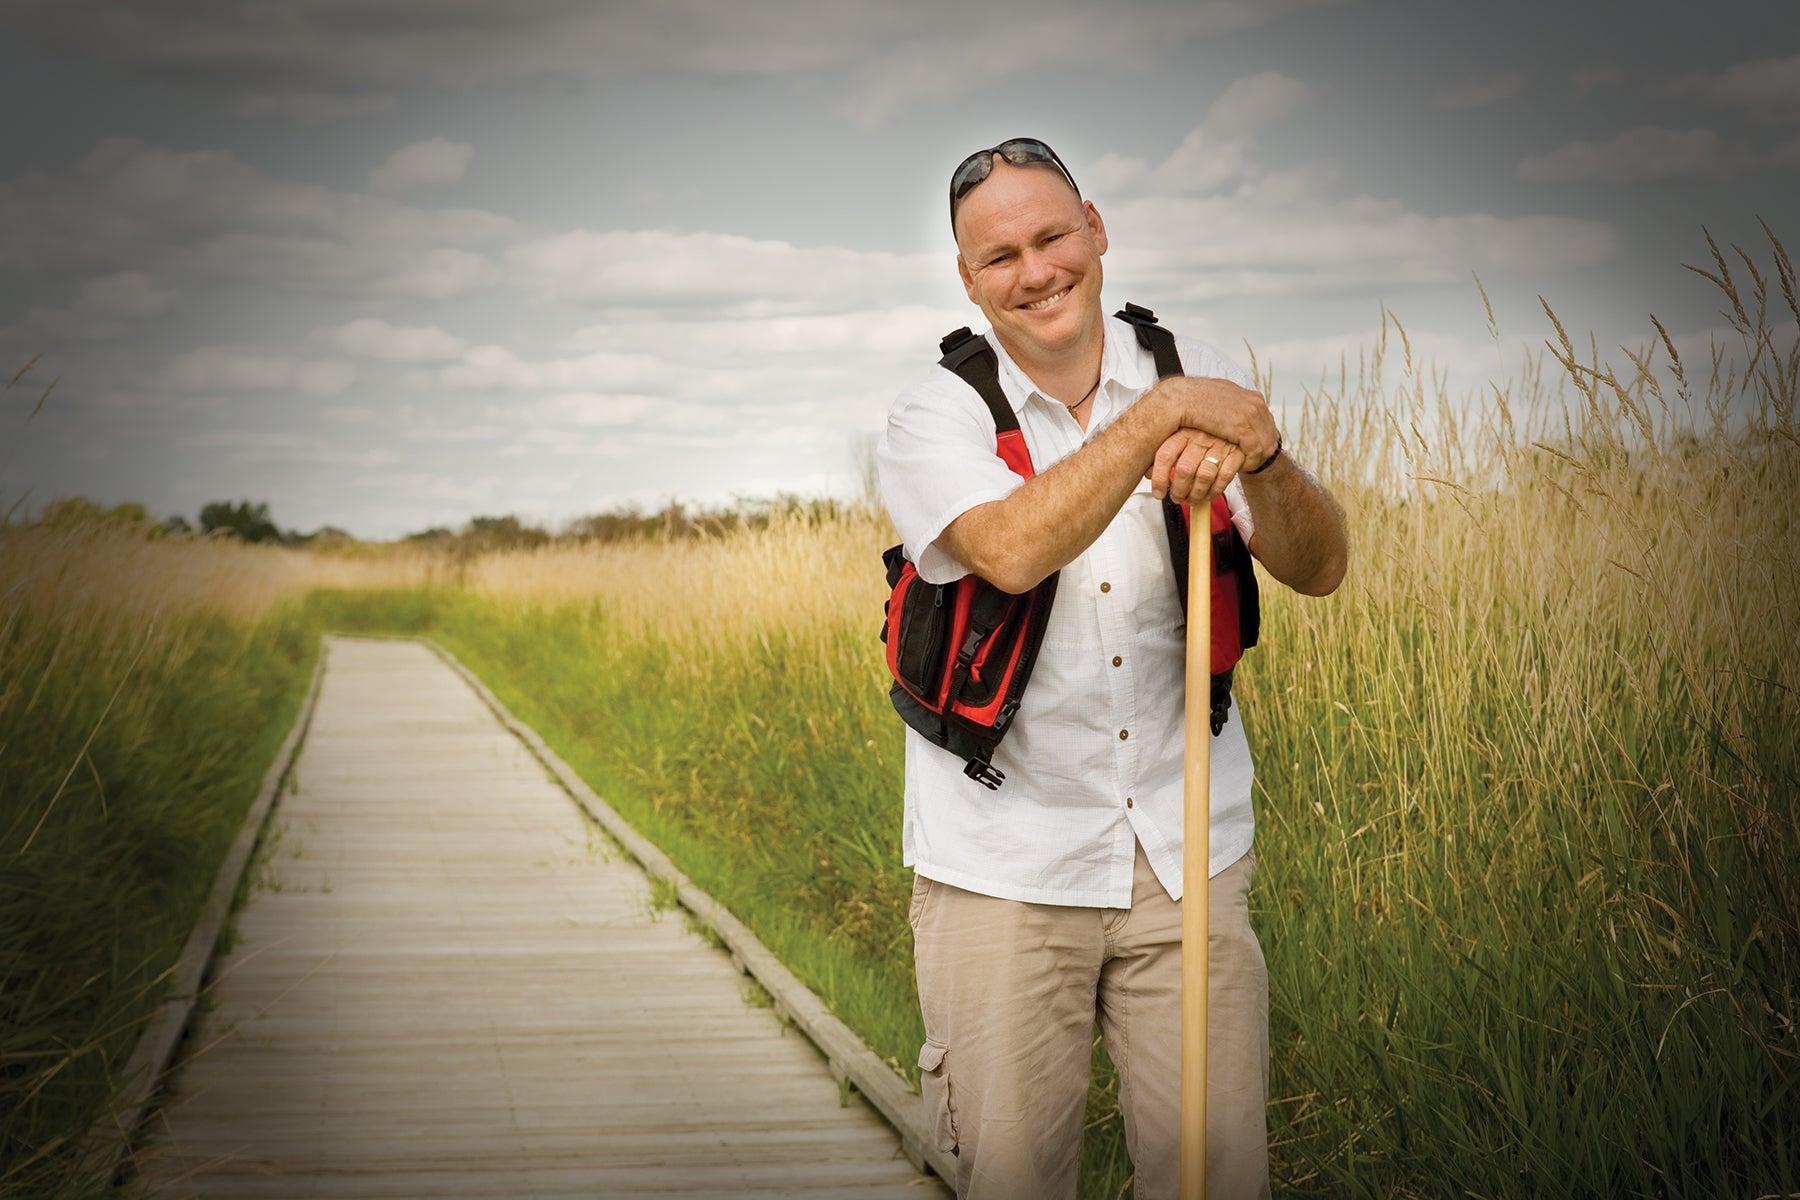 Rutabaga Paddlesport owner Darren Bush